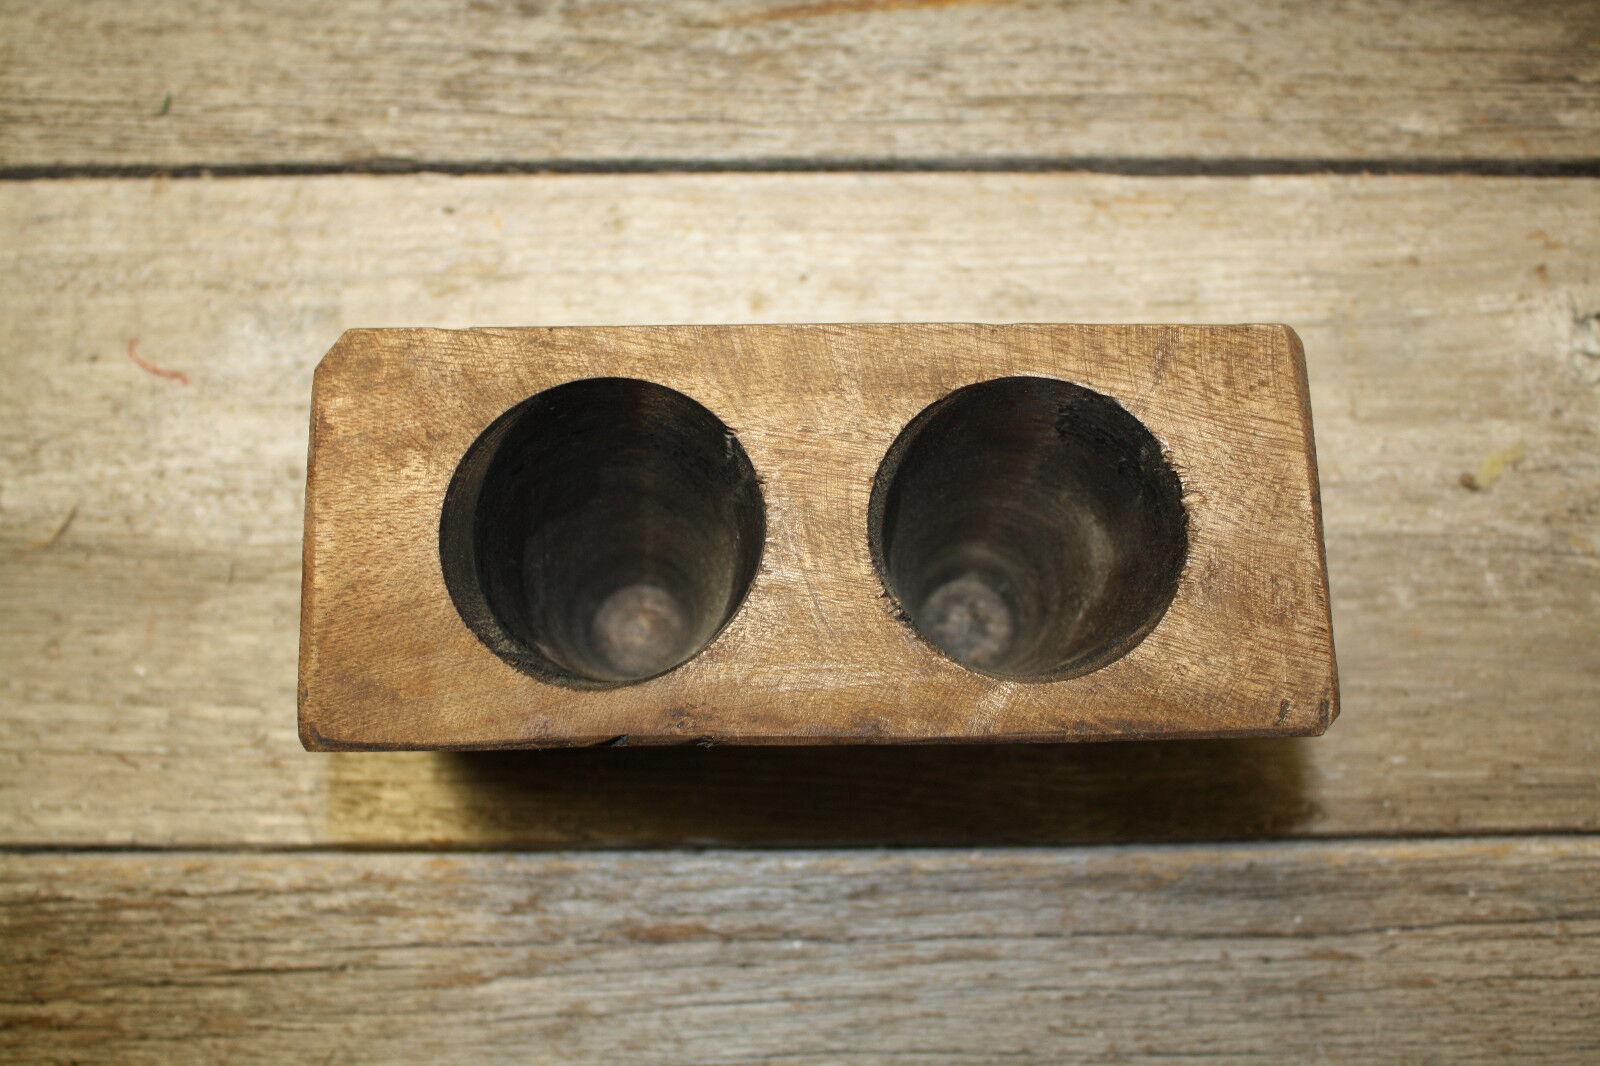 Lot of 20, 2 Hole Wooden Sugar Mold Wood Candle Holder Primitive